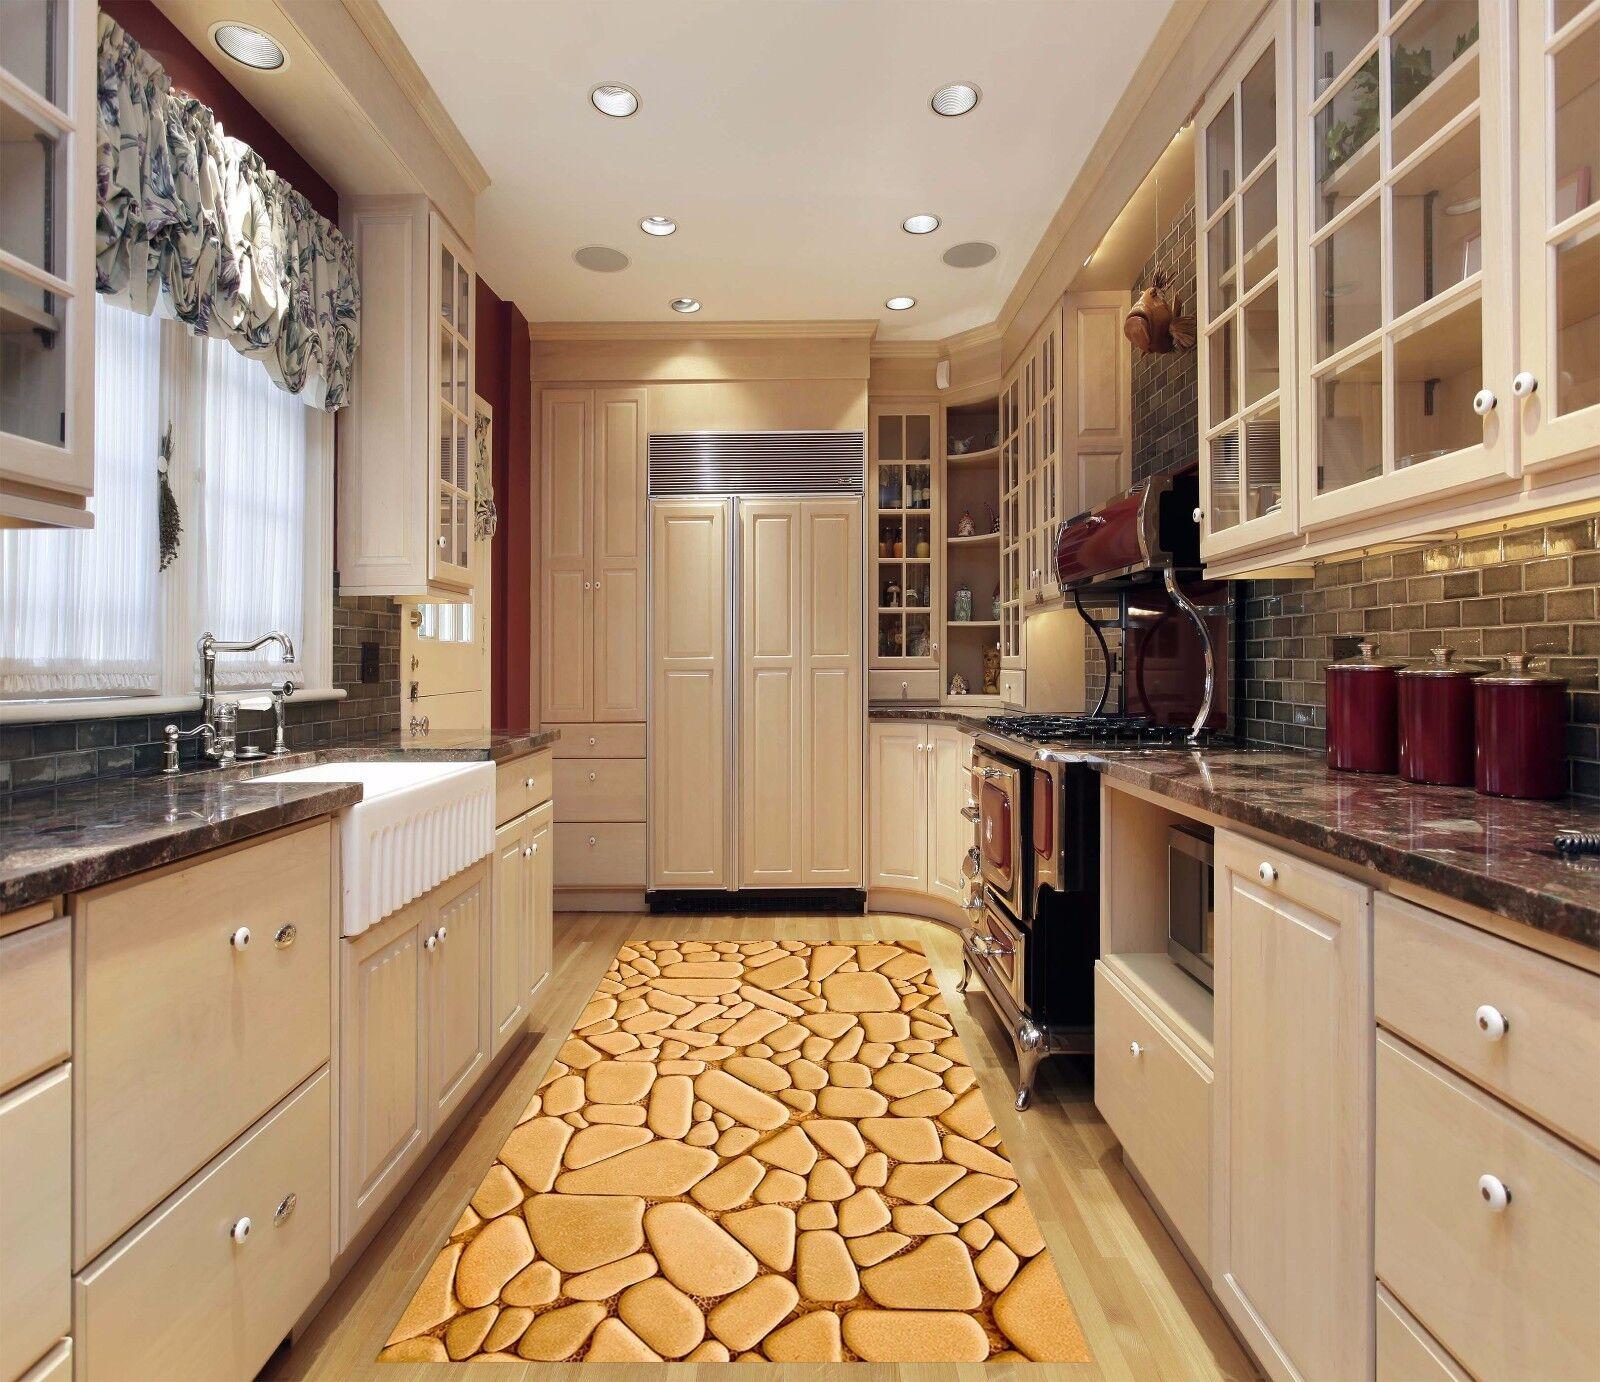 3D Yellow Stone 55 Kitchen Mat Floor Murals Wall Print Wall AJ WALLPAPER AU Kyra